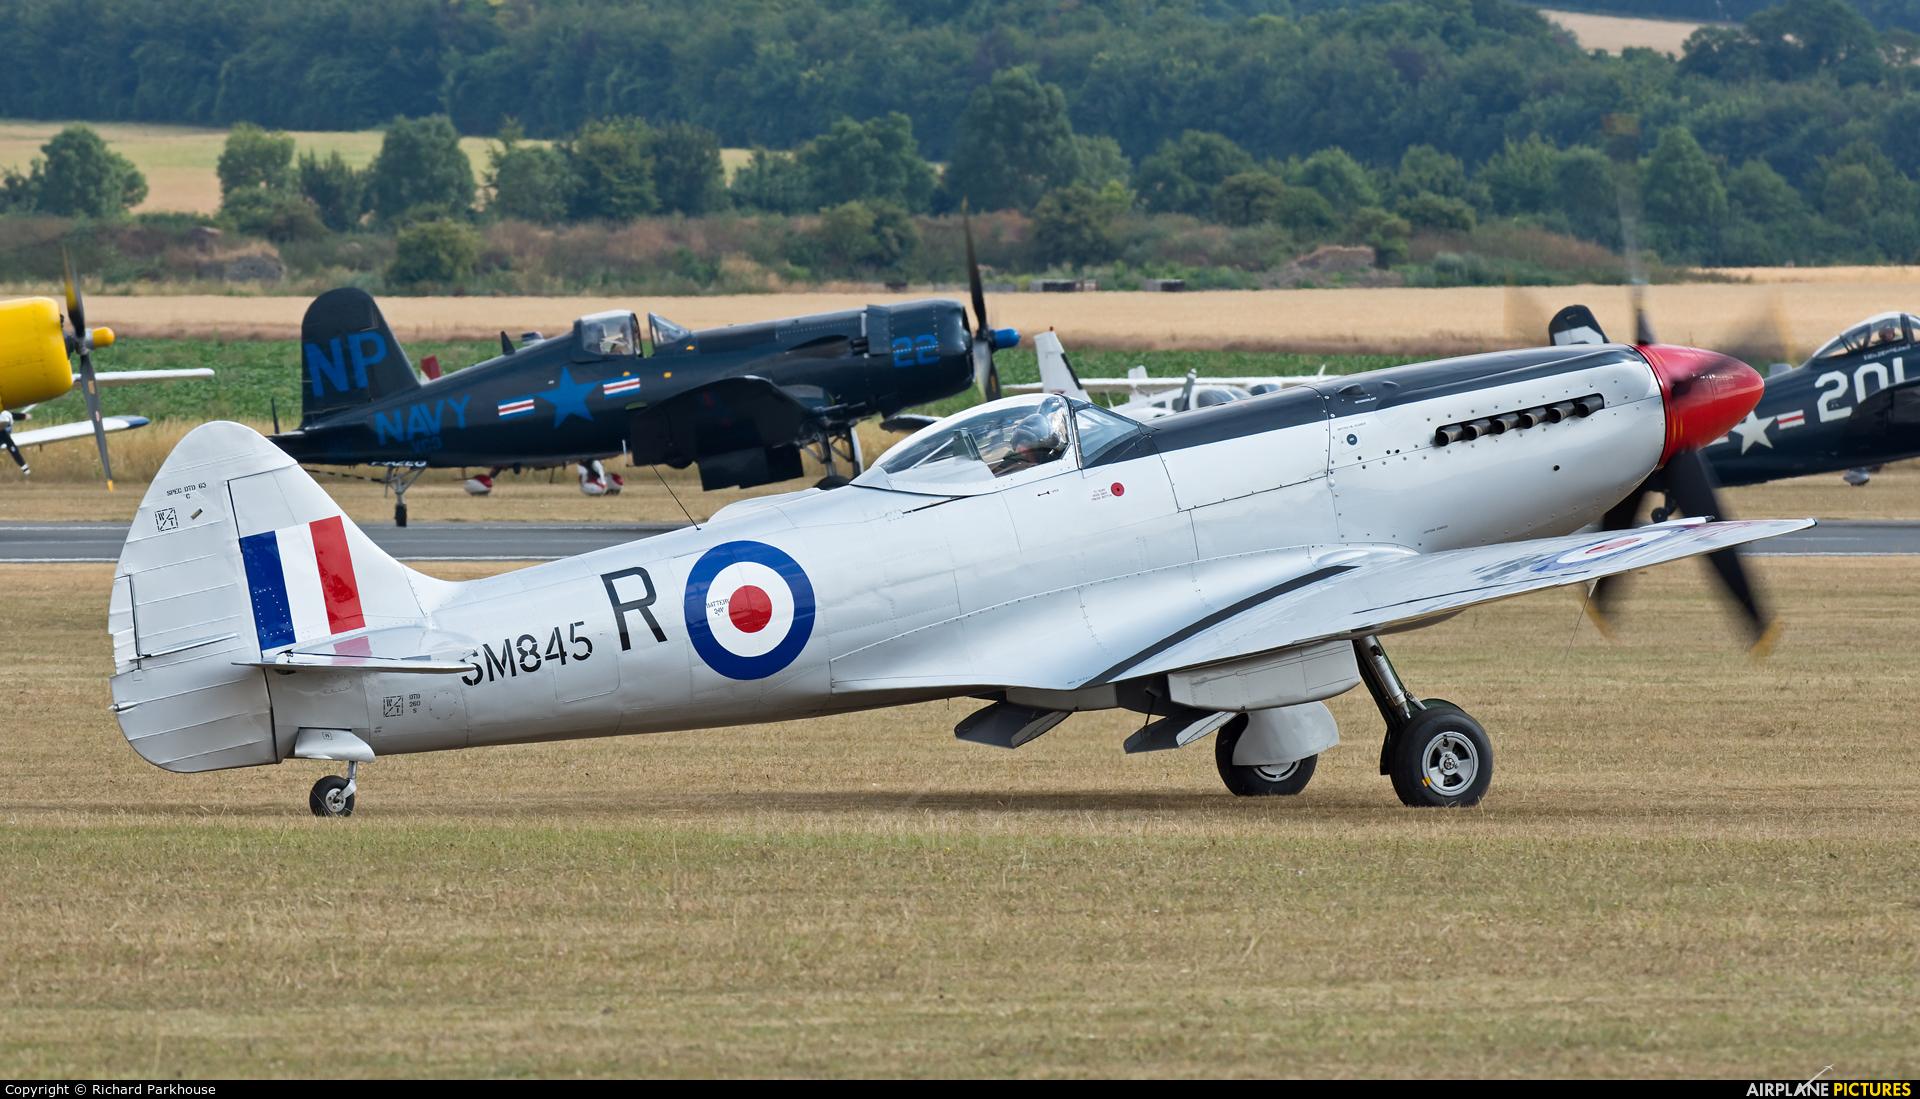 Spitfire G-BUOS aircraft at Duxford